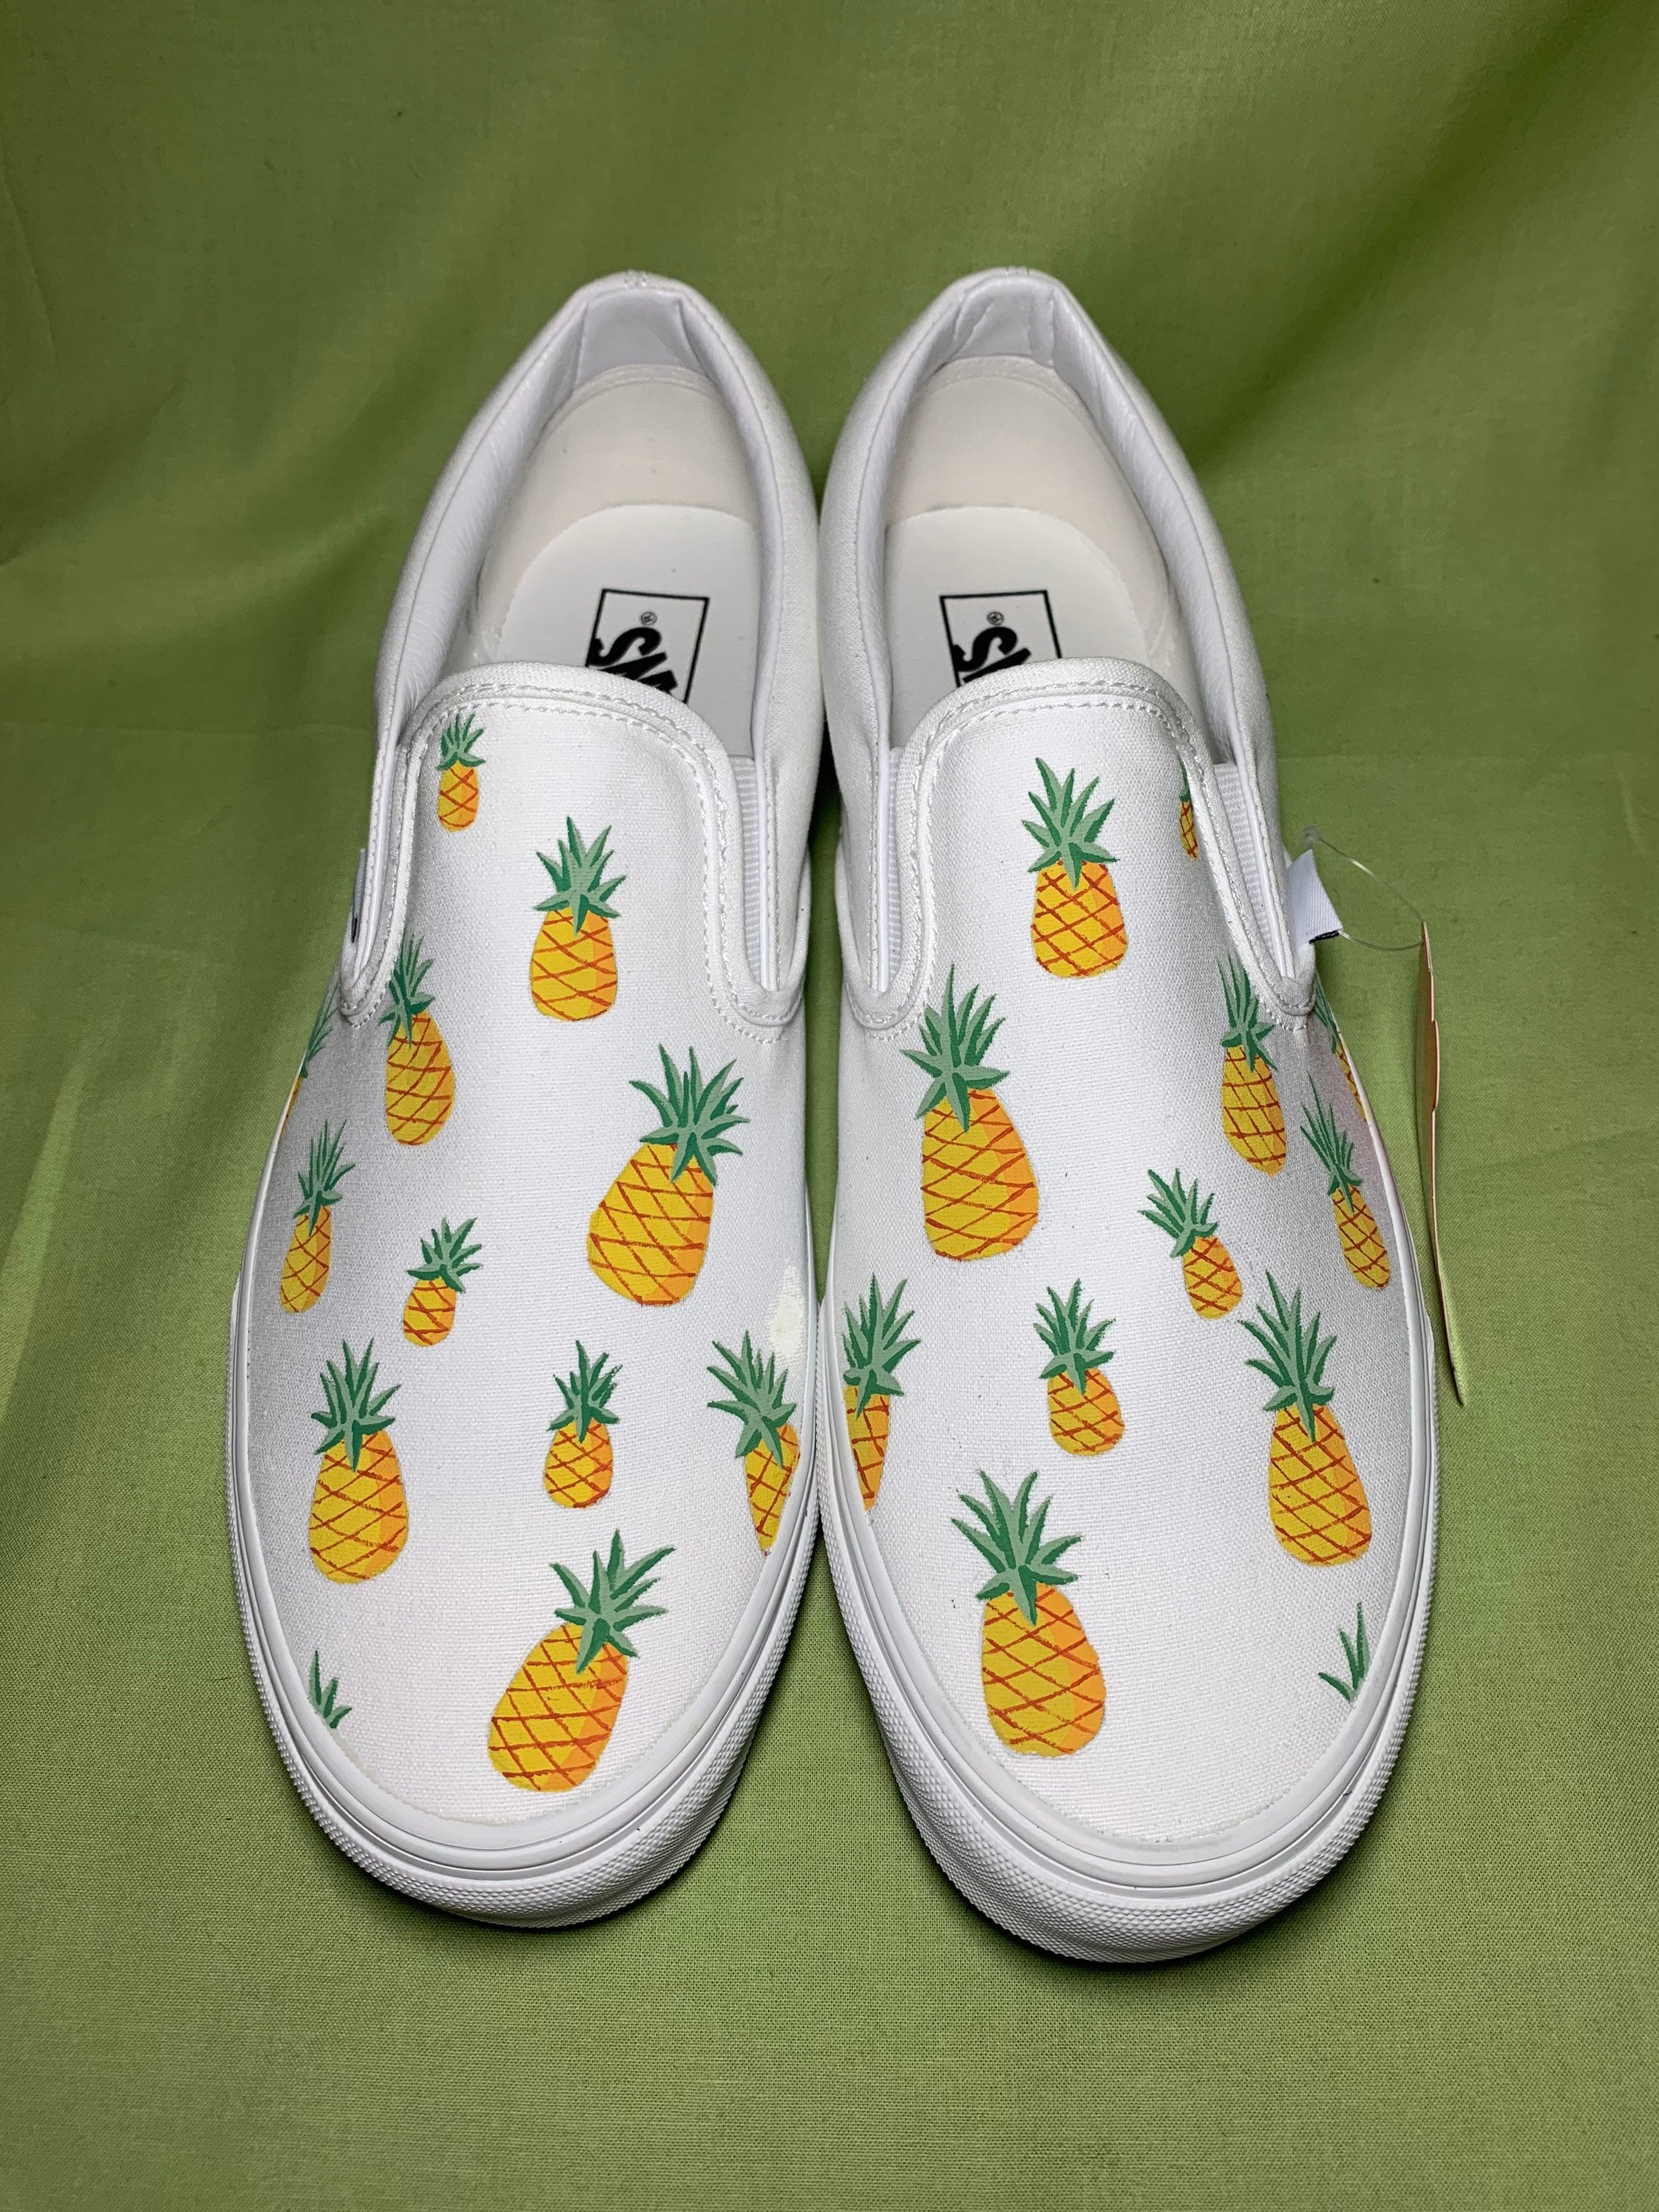 Ananas Vans, Furgoni dipinti in modo personalizzato, scarpe dipinte a mano